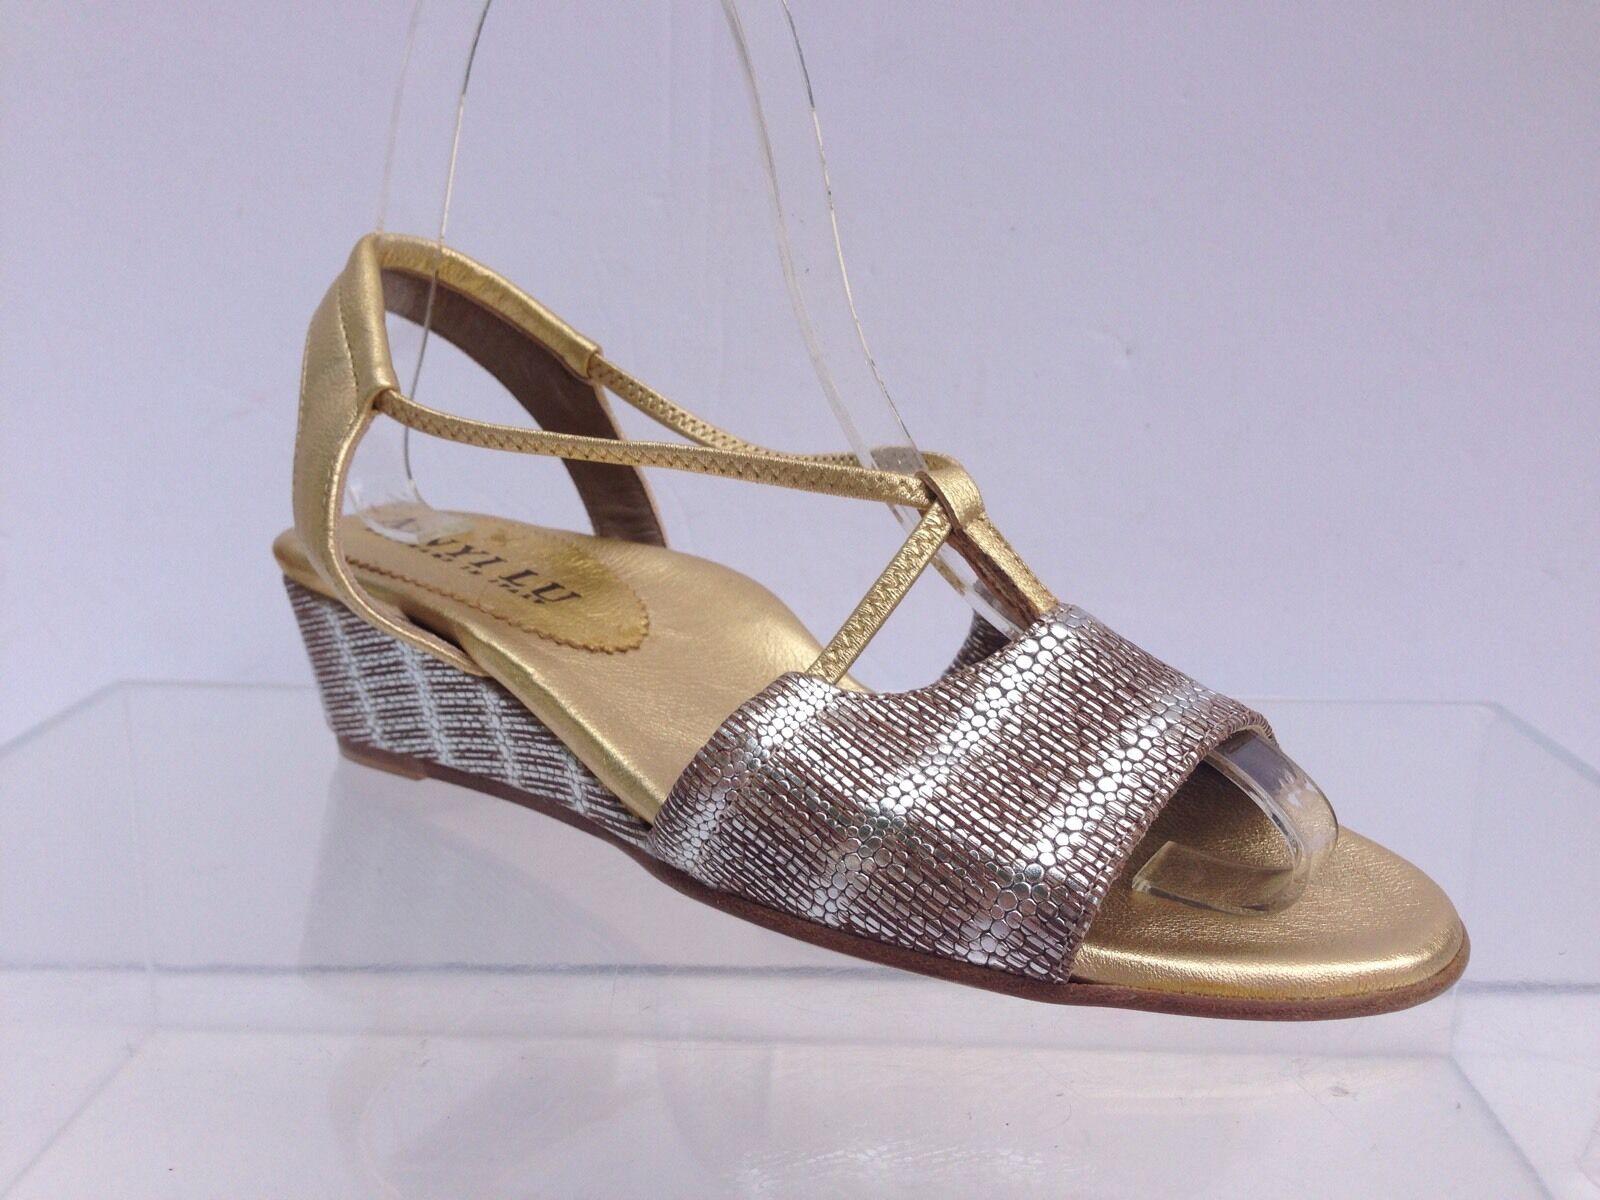 Anyi Lu Linda Or argent Sandale Femme Taille 34.5 Neuf  385